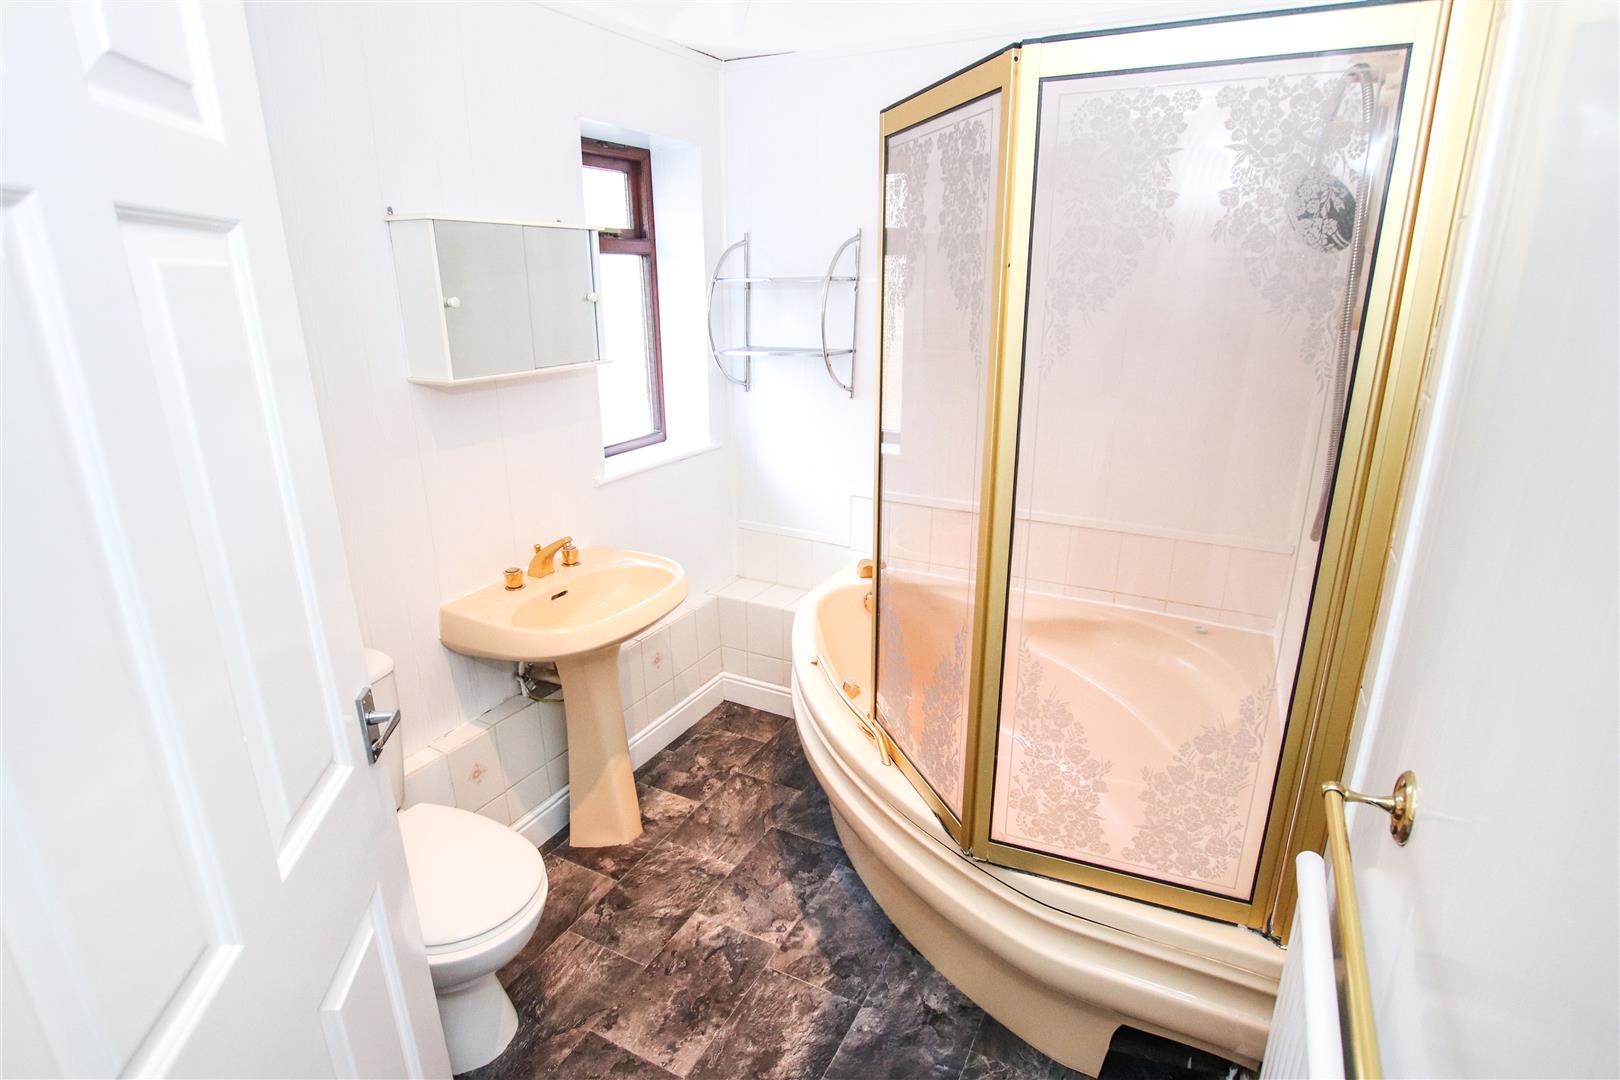 LUXURY FIRST FLOOR BATHROOM